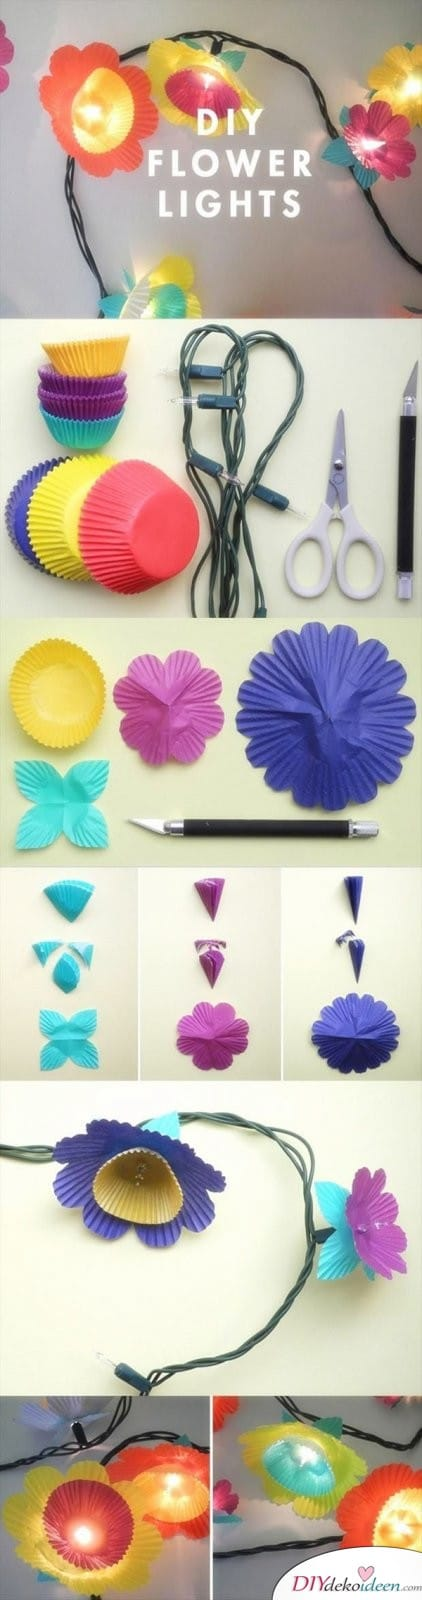 15 Bastelideen DIY Lampen selber machen - DIY Blumenlichterkette